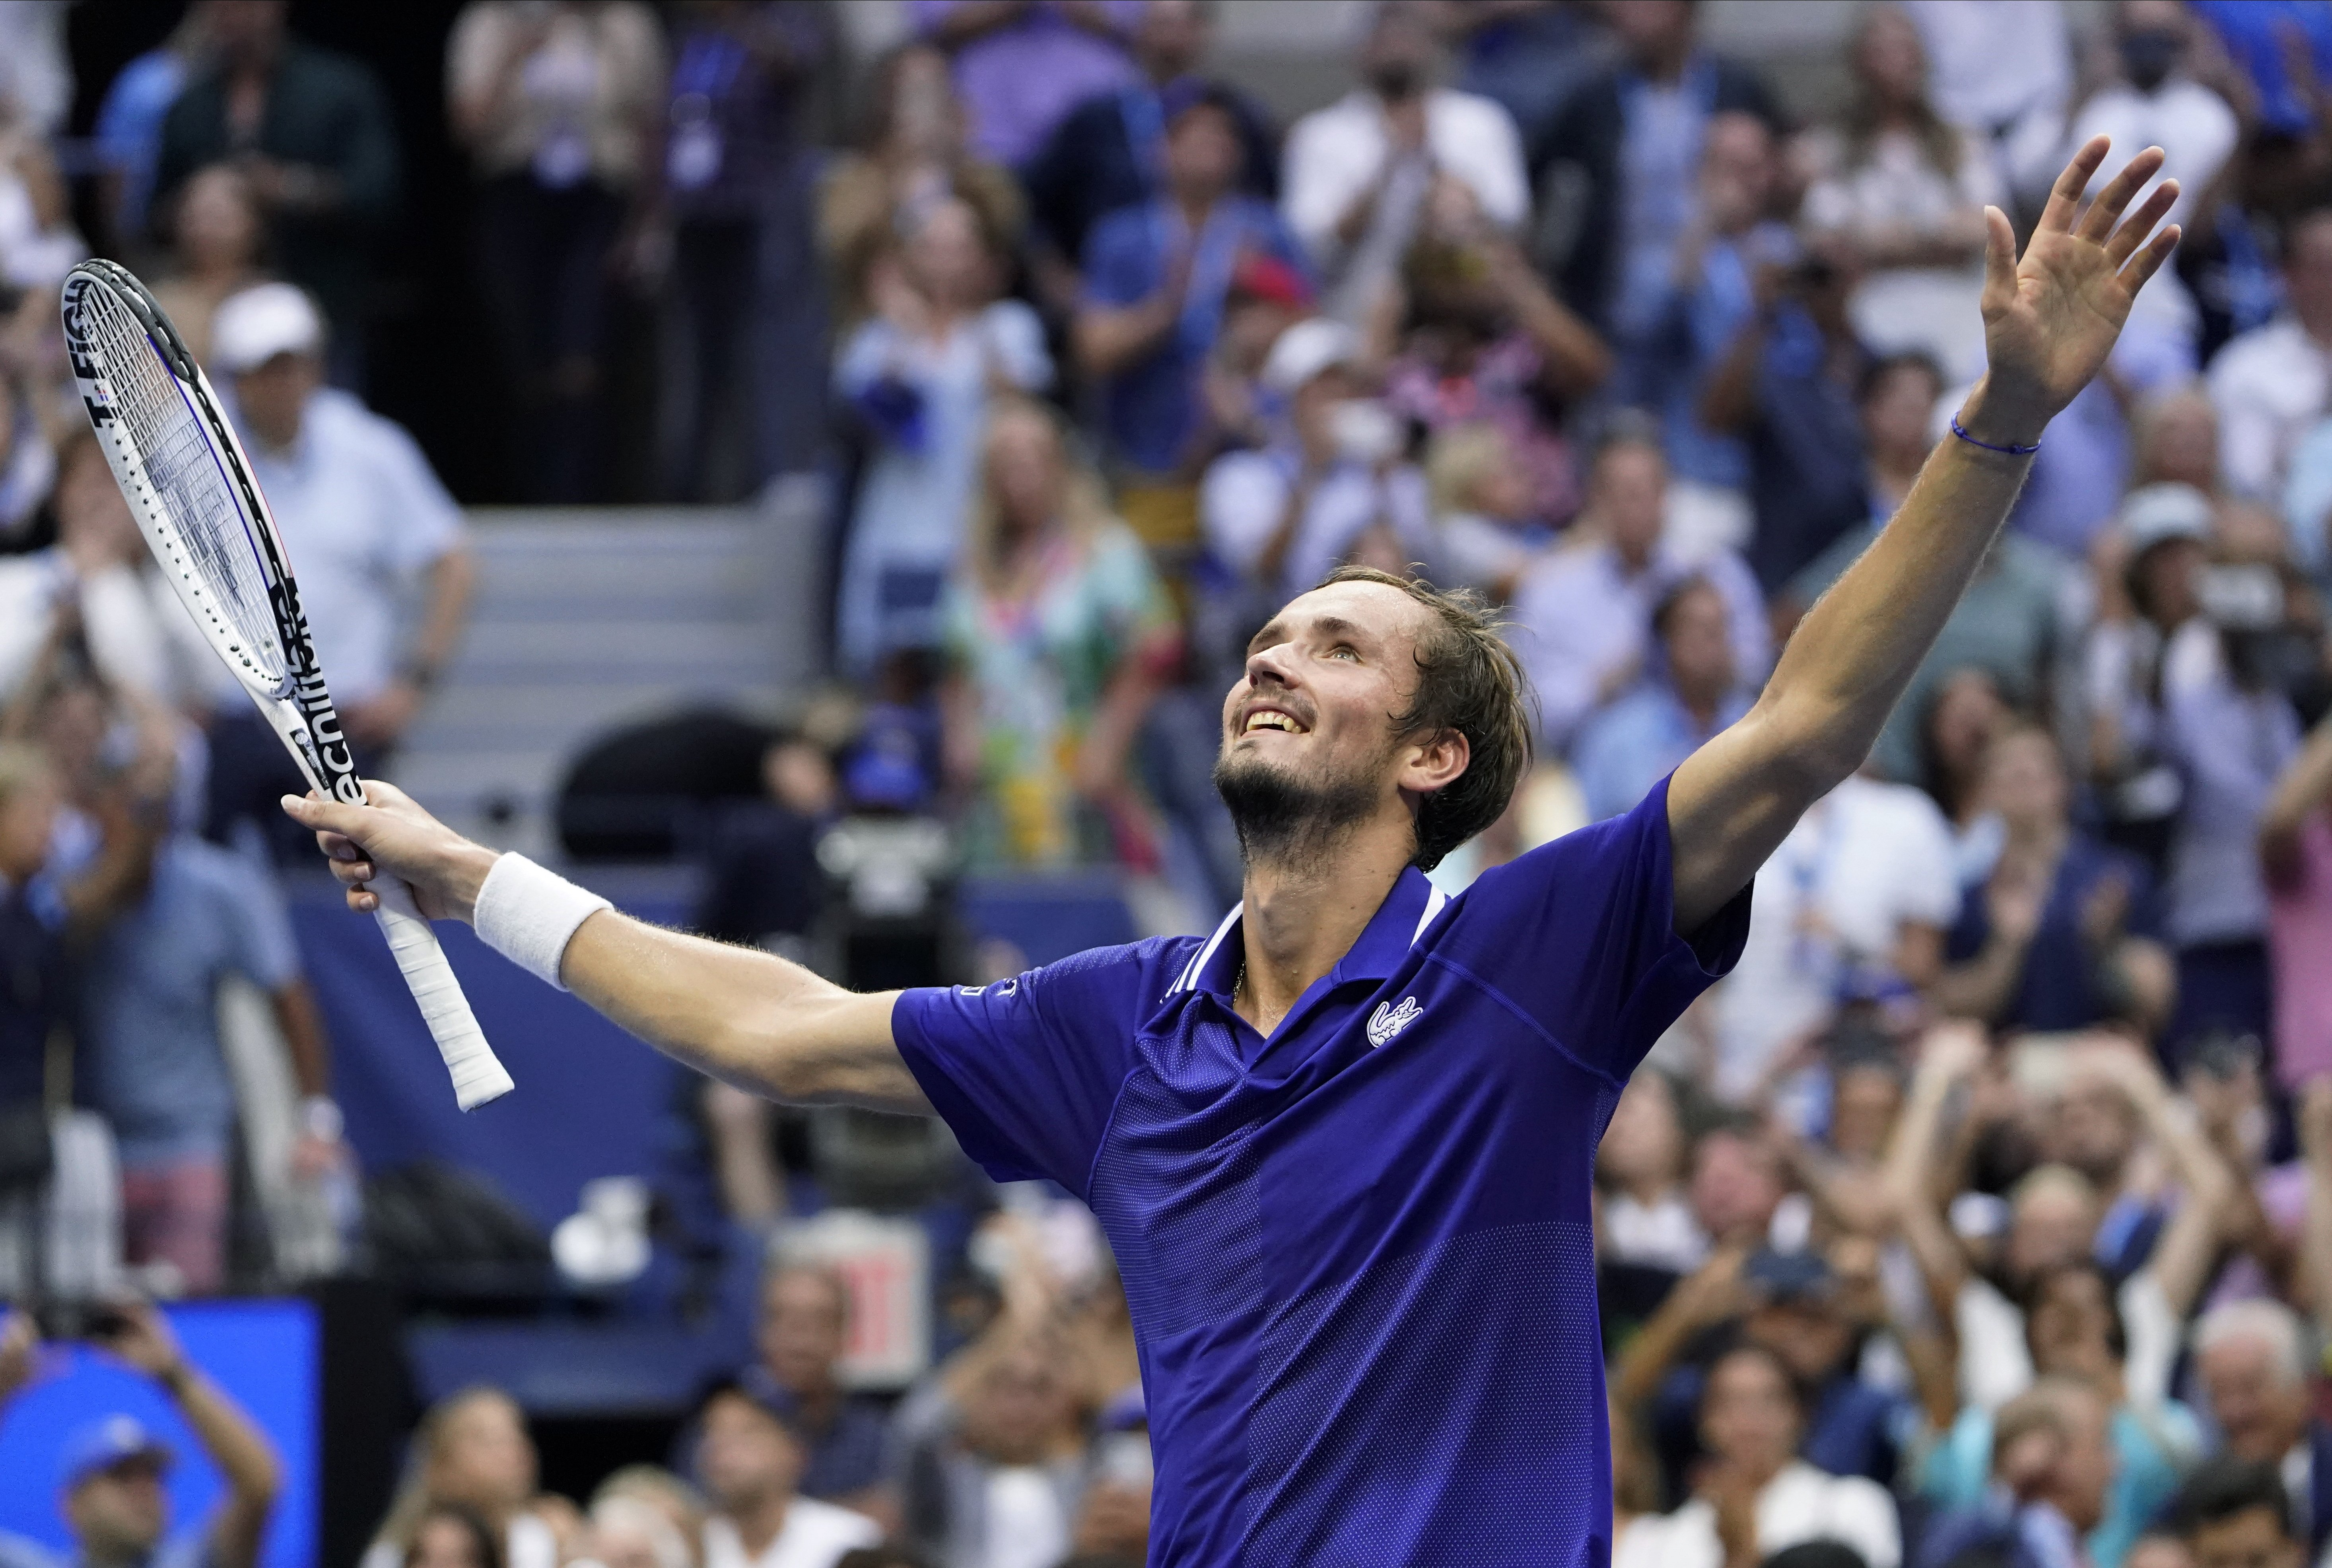 Medvedev ends Djokovic's bid for calendar-year Grand Slam at US Open